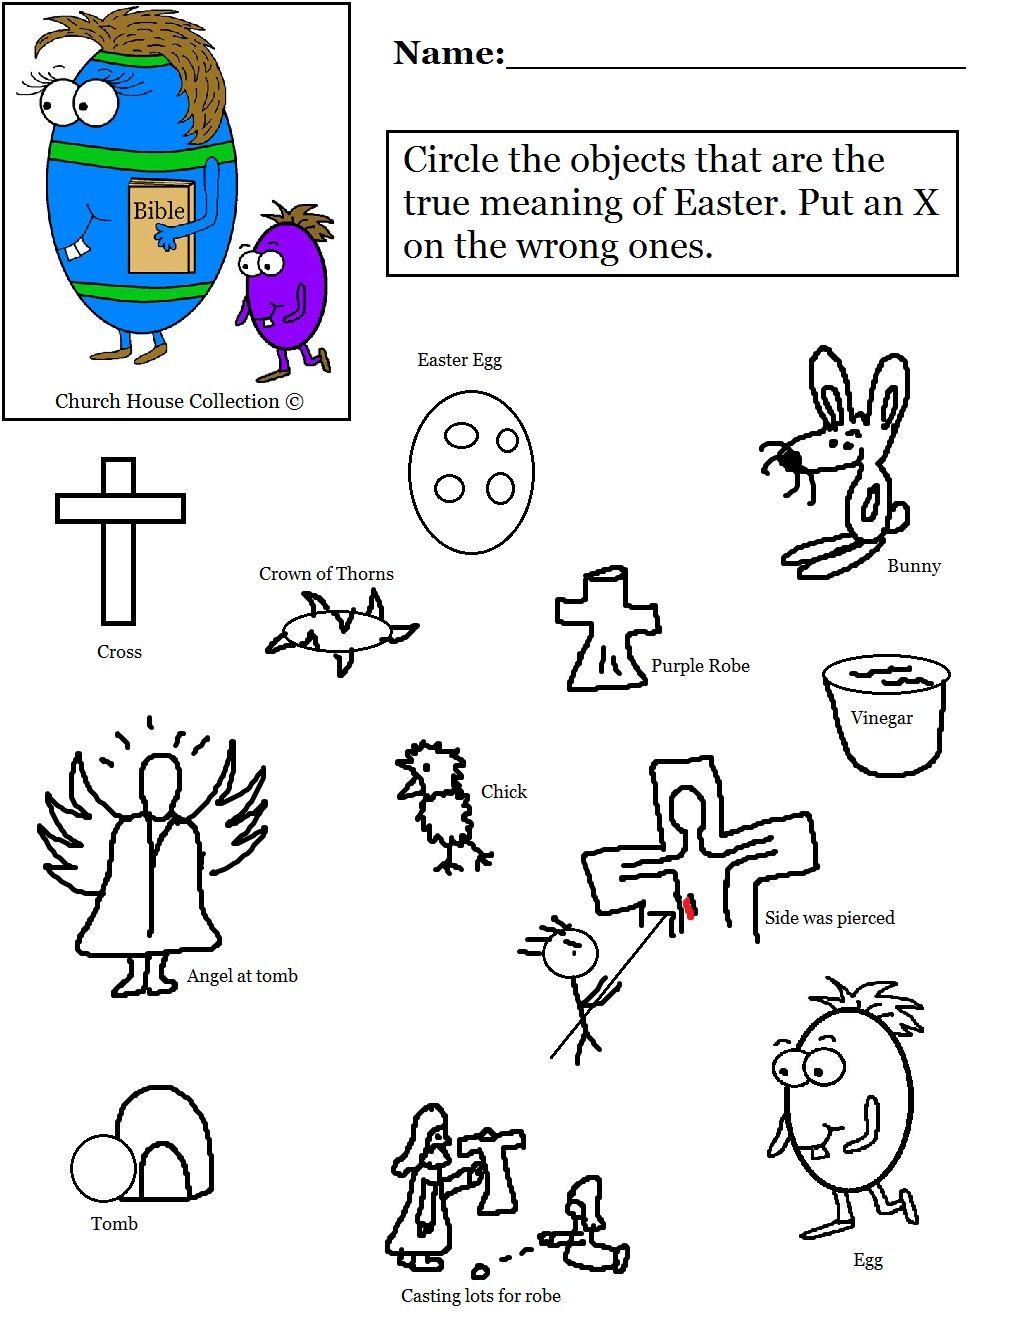 Worksheets Bible Worksheets For Preschoolers church house collection blog easter egg with bible worksheet worksheet